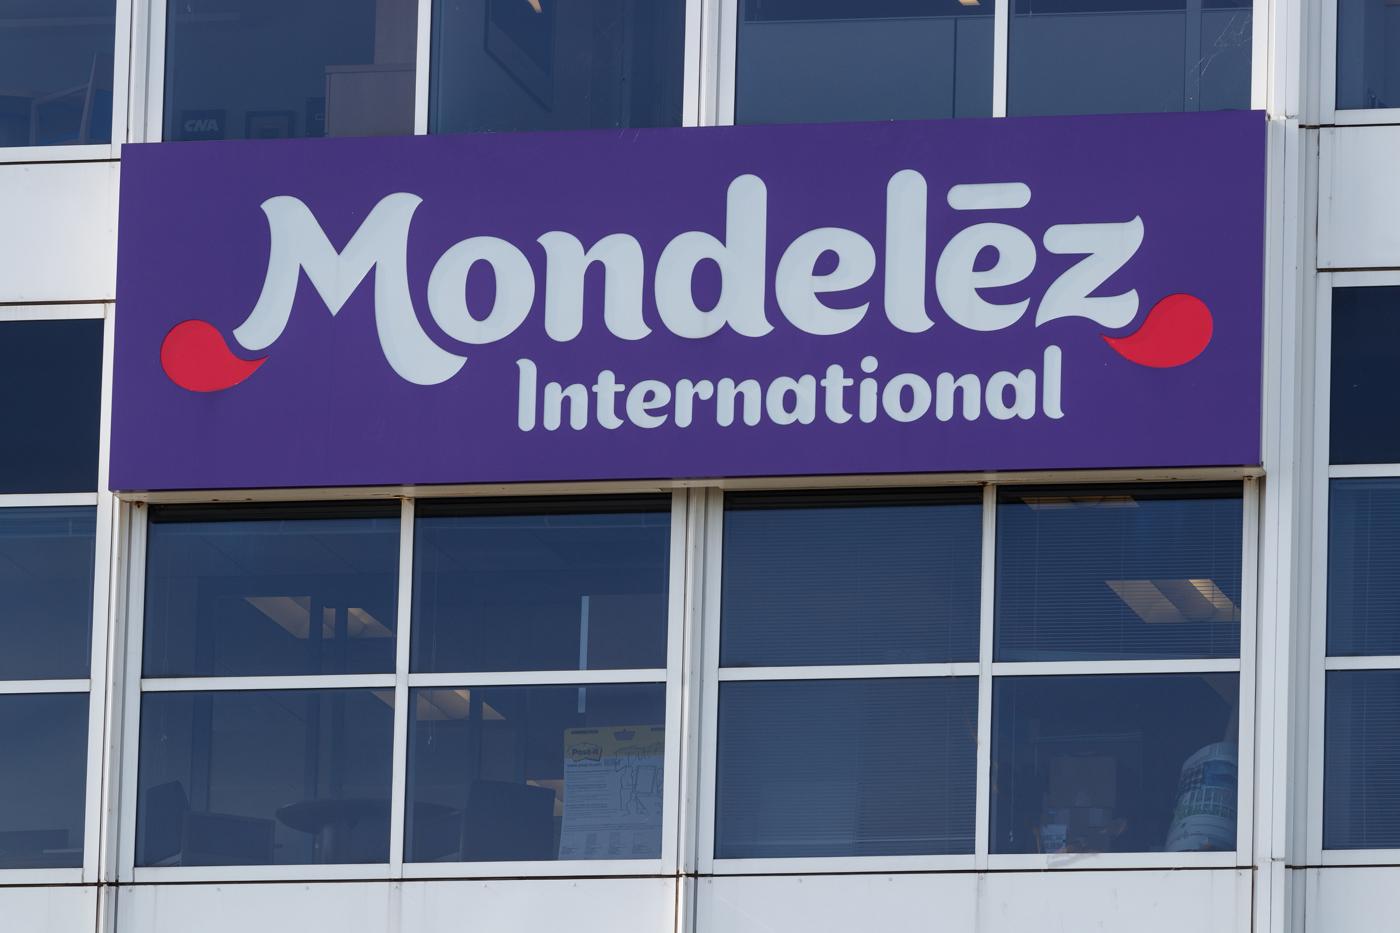 Mondelez MDLZ stock news and analysis